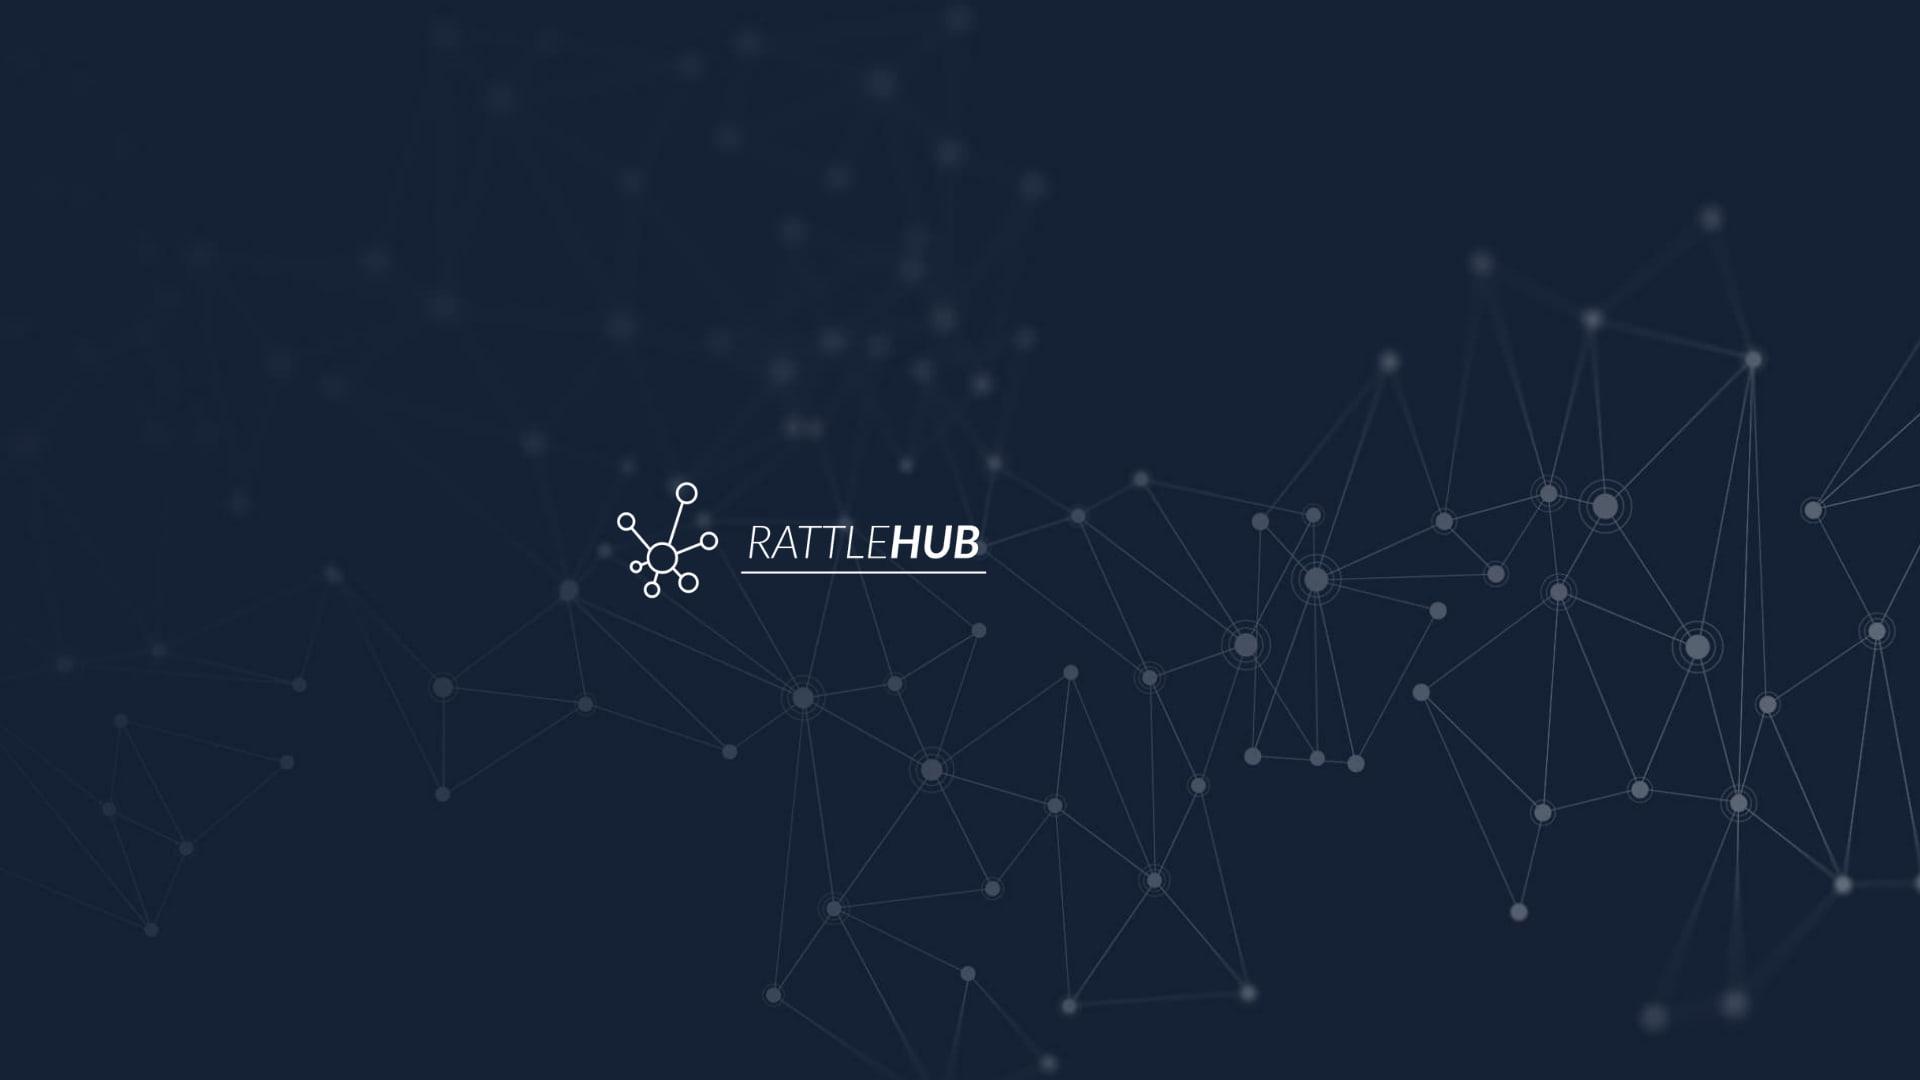 RattleHub